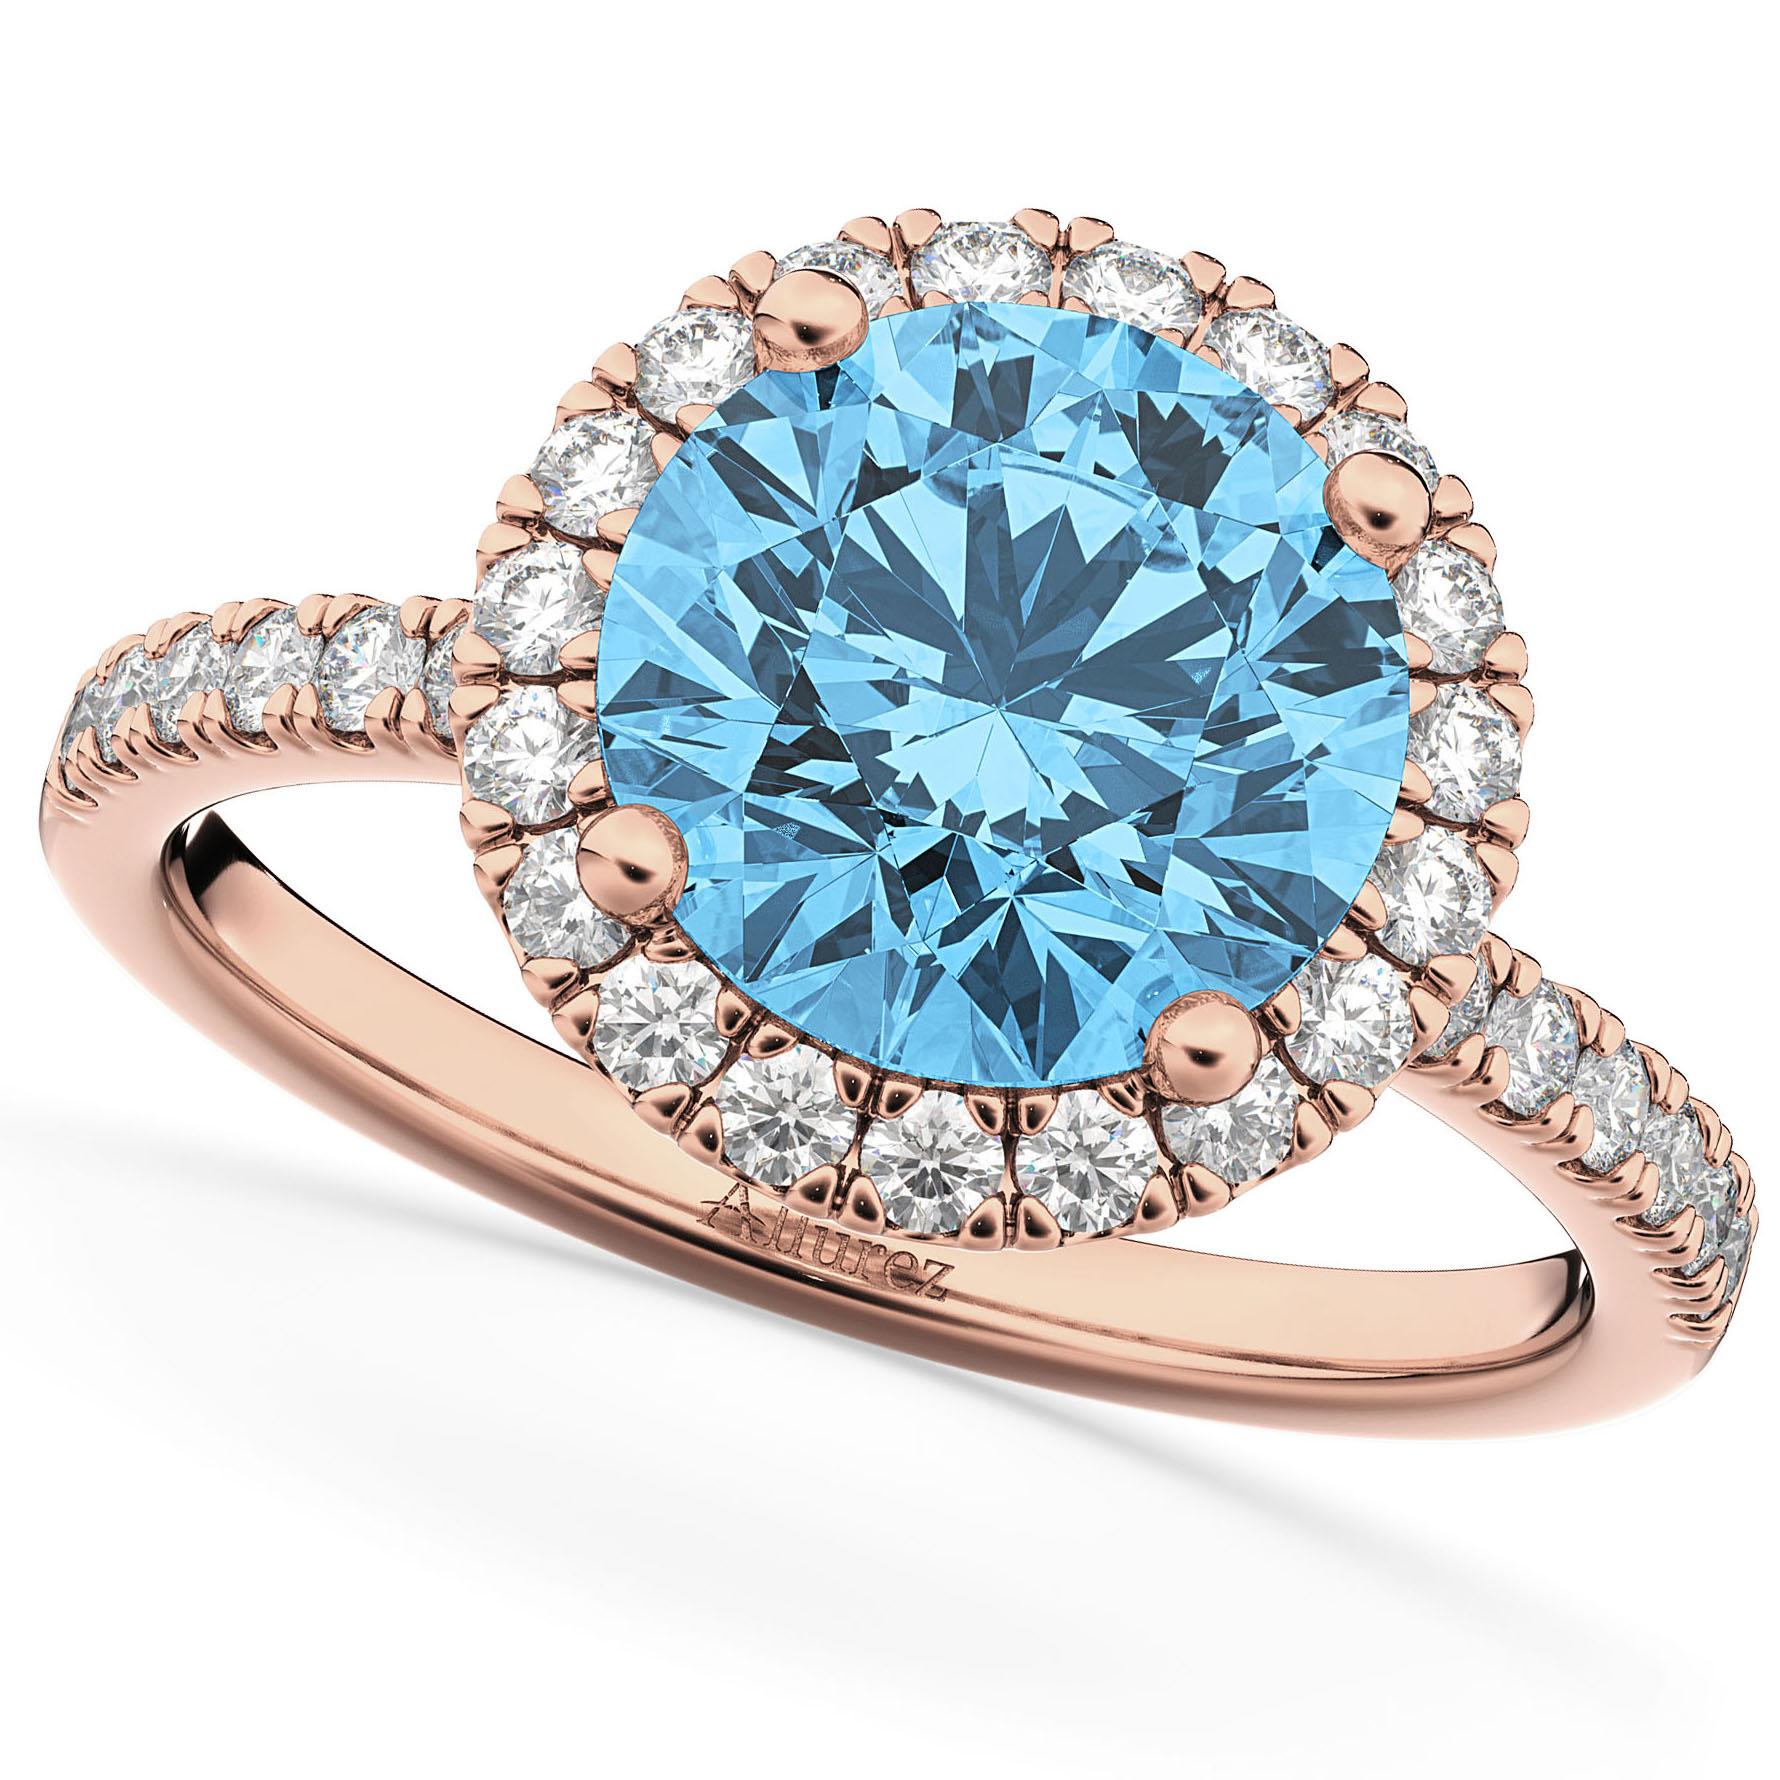 Halo Blue Topaz & Diamond Engagement Ring 18K Rose Gold 3.00ct